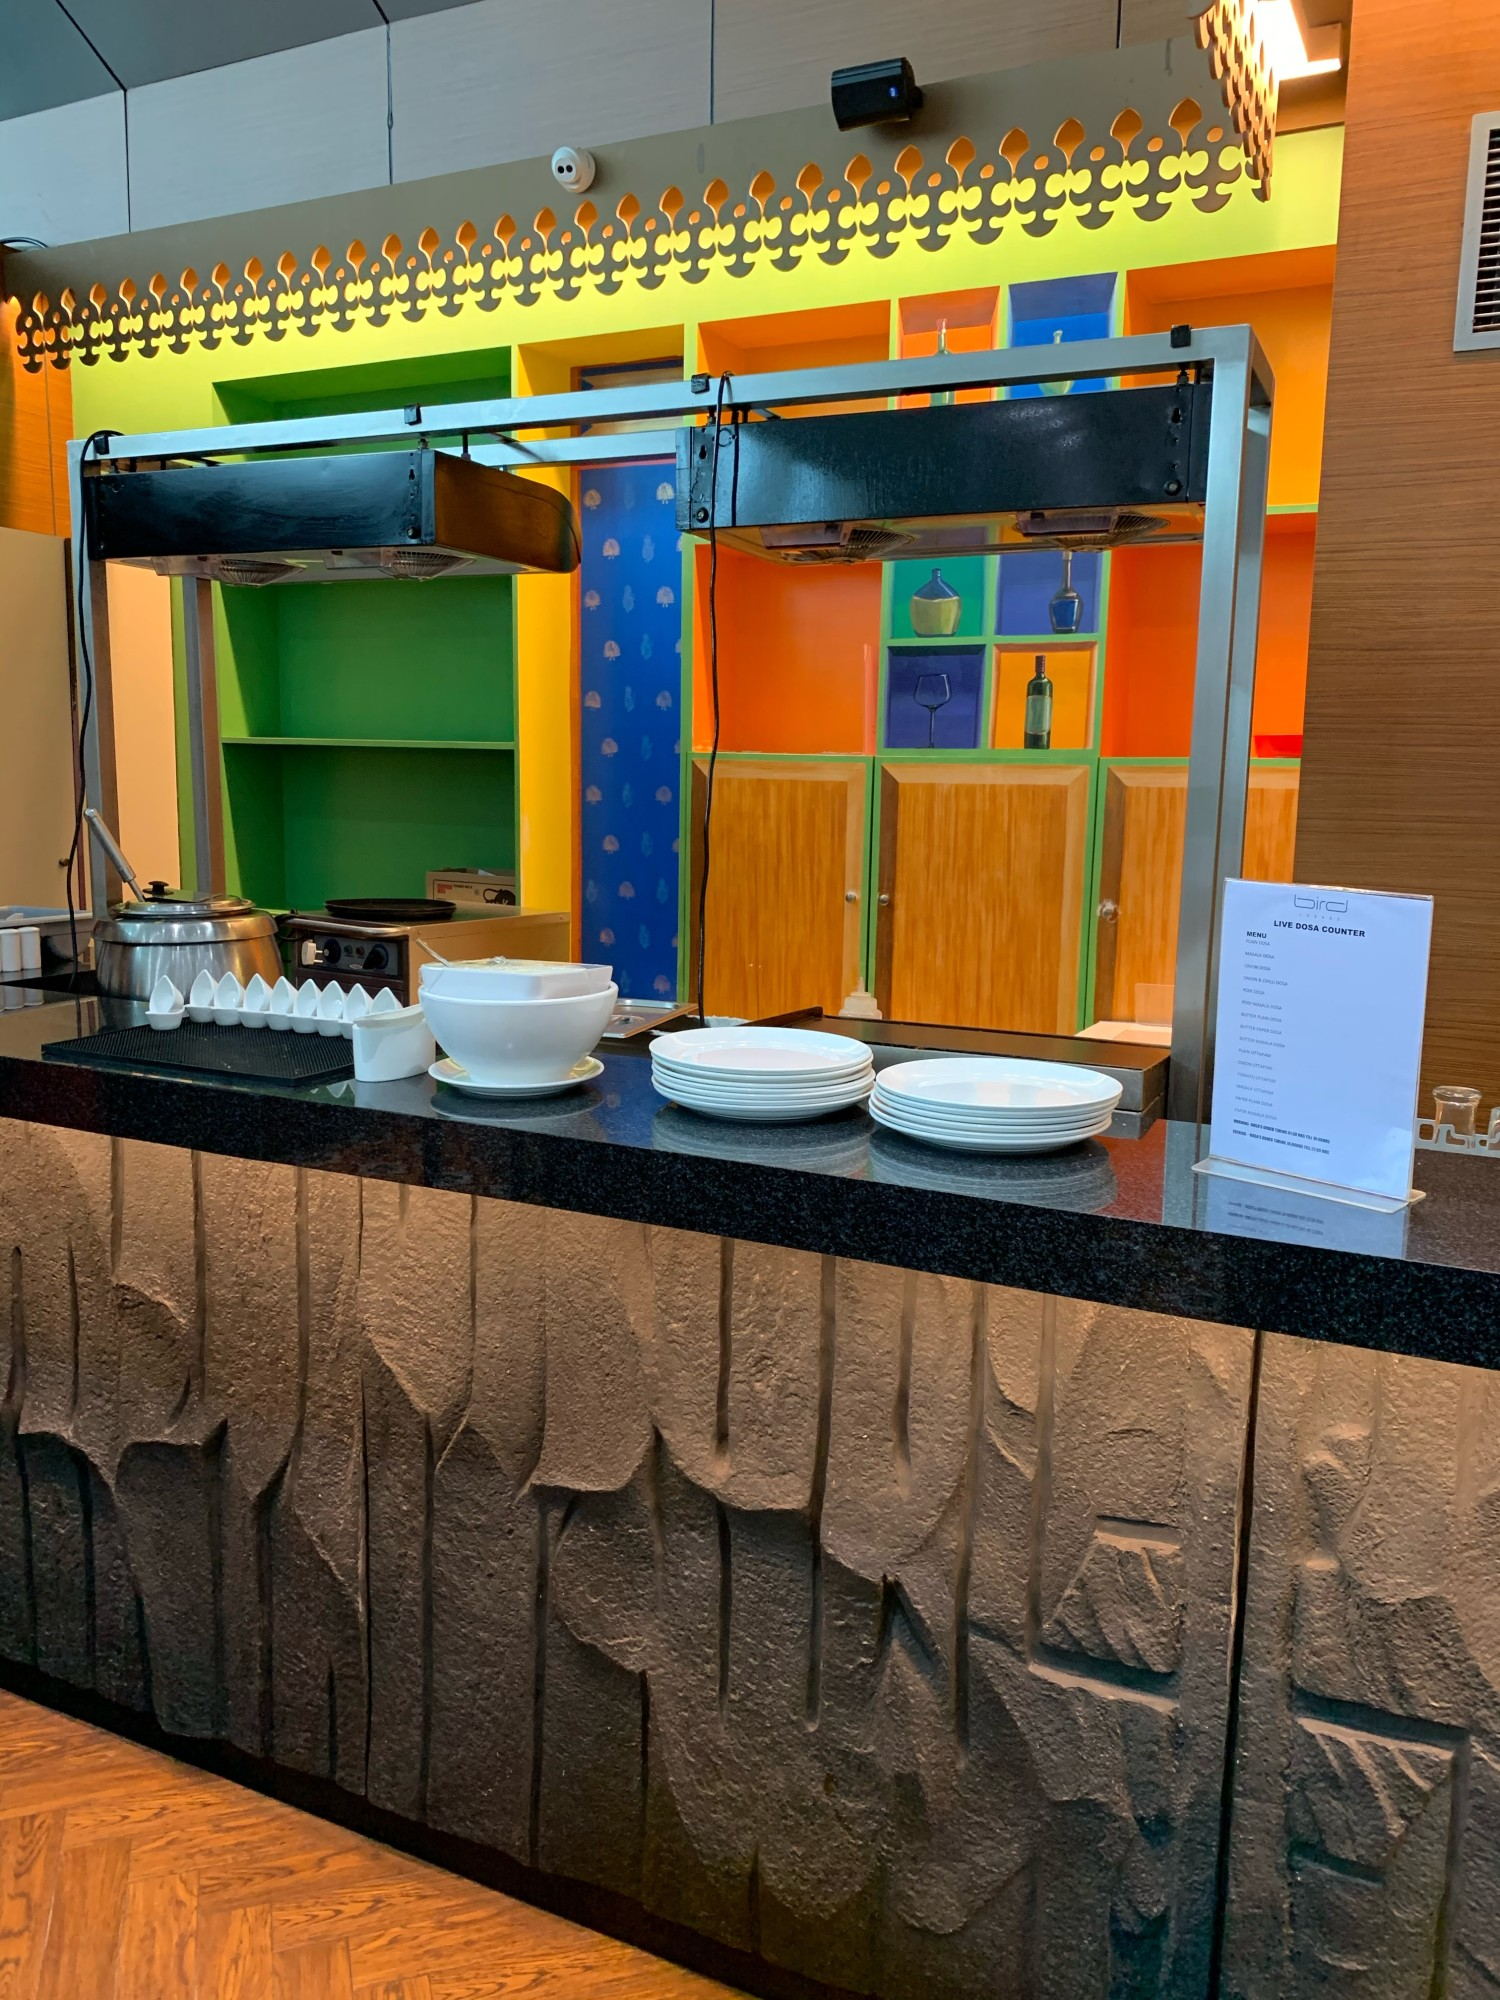 TRV: Trivandrum International Airport Lounge Access (India